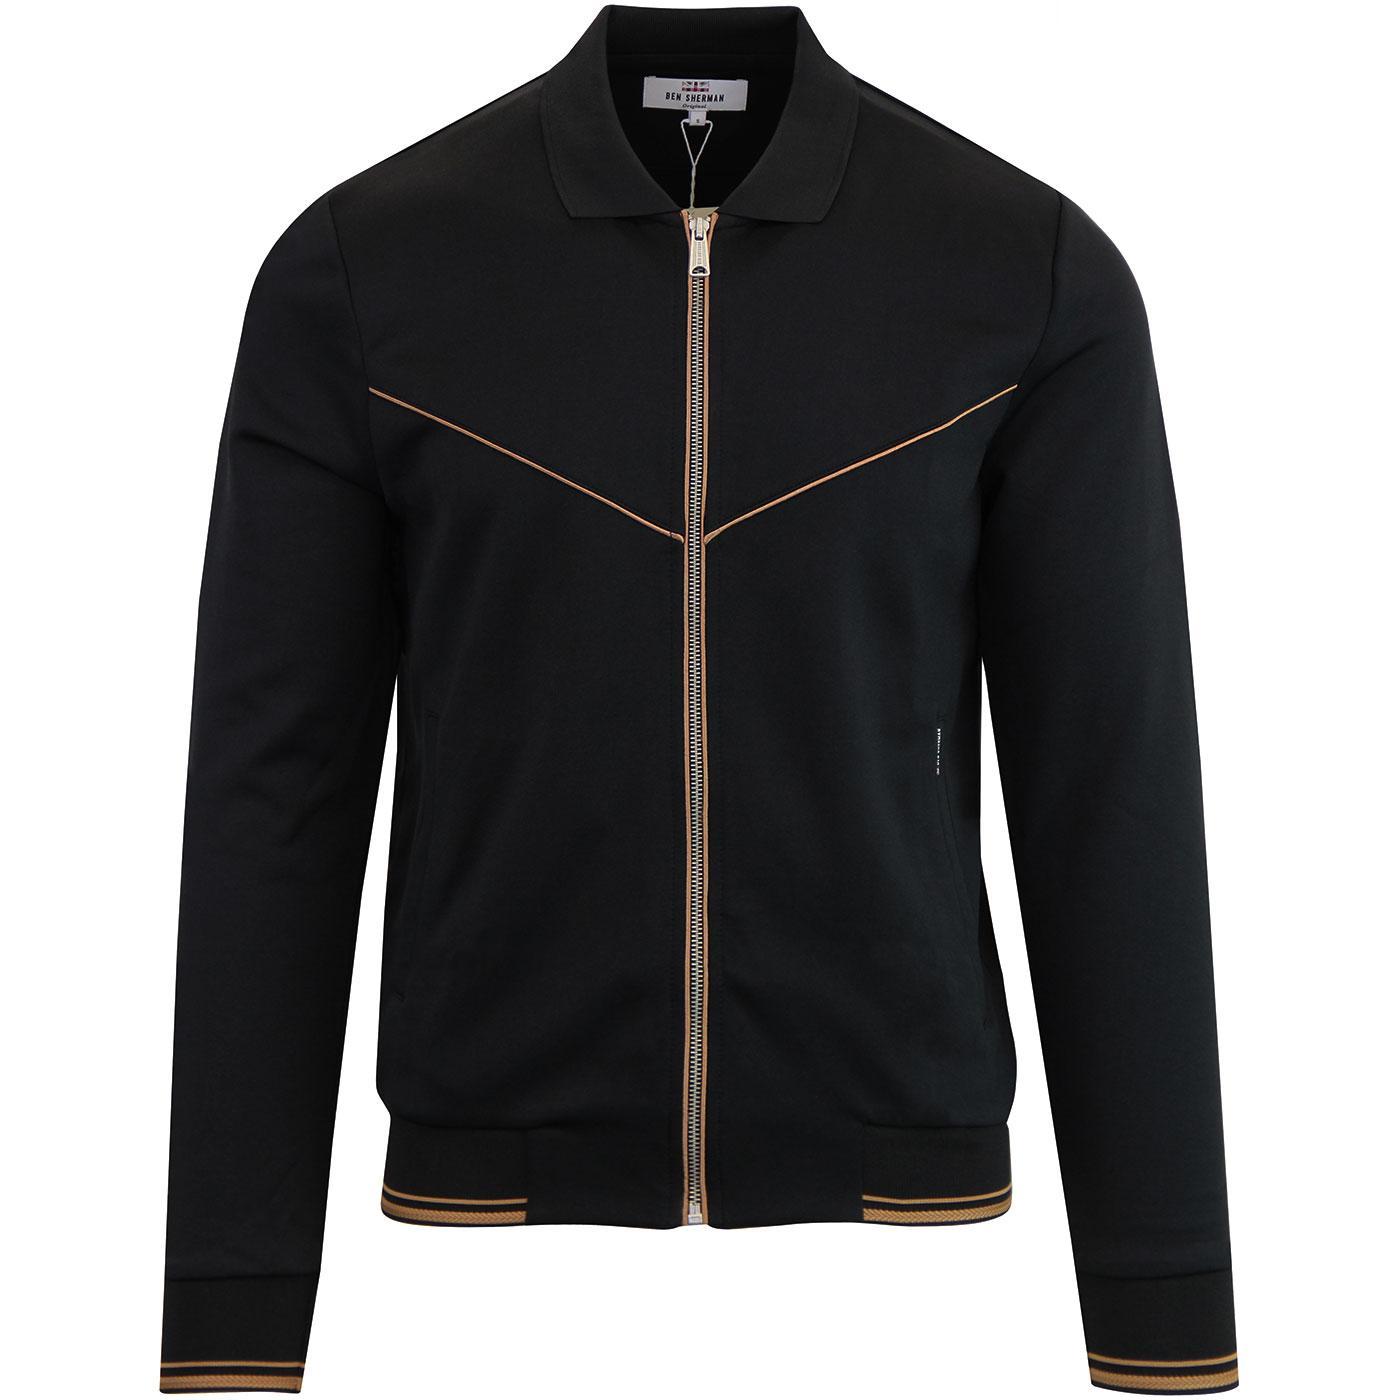 BEN SHERMAN Mod Tricot Polo Collar Track Top BLACK